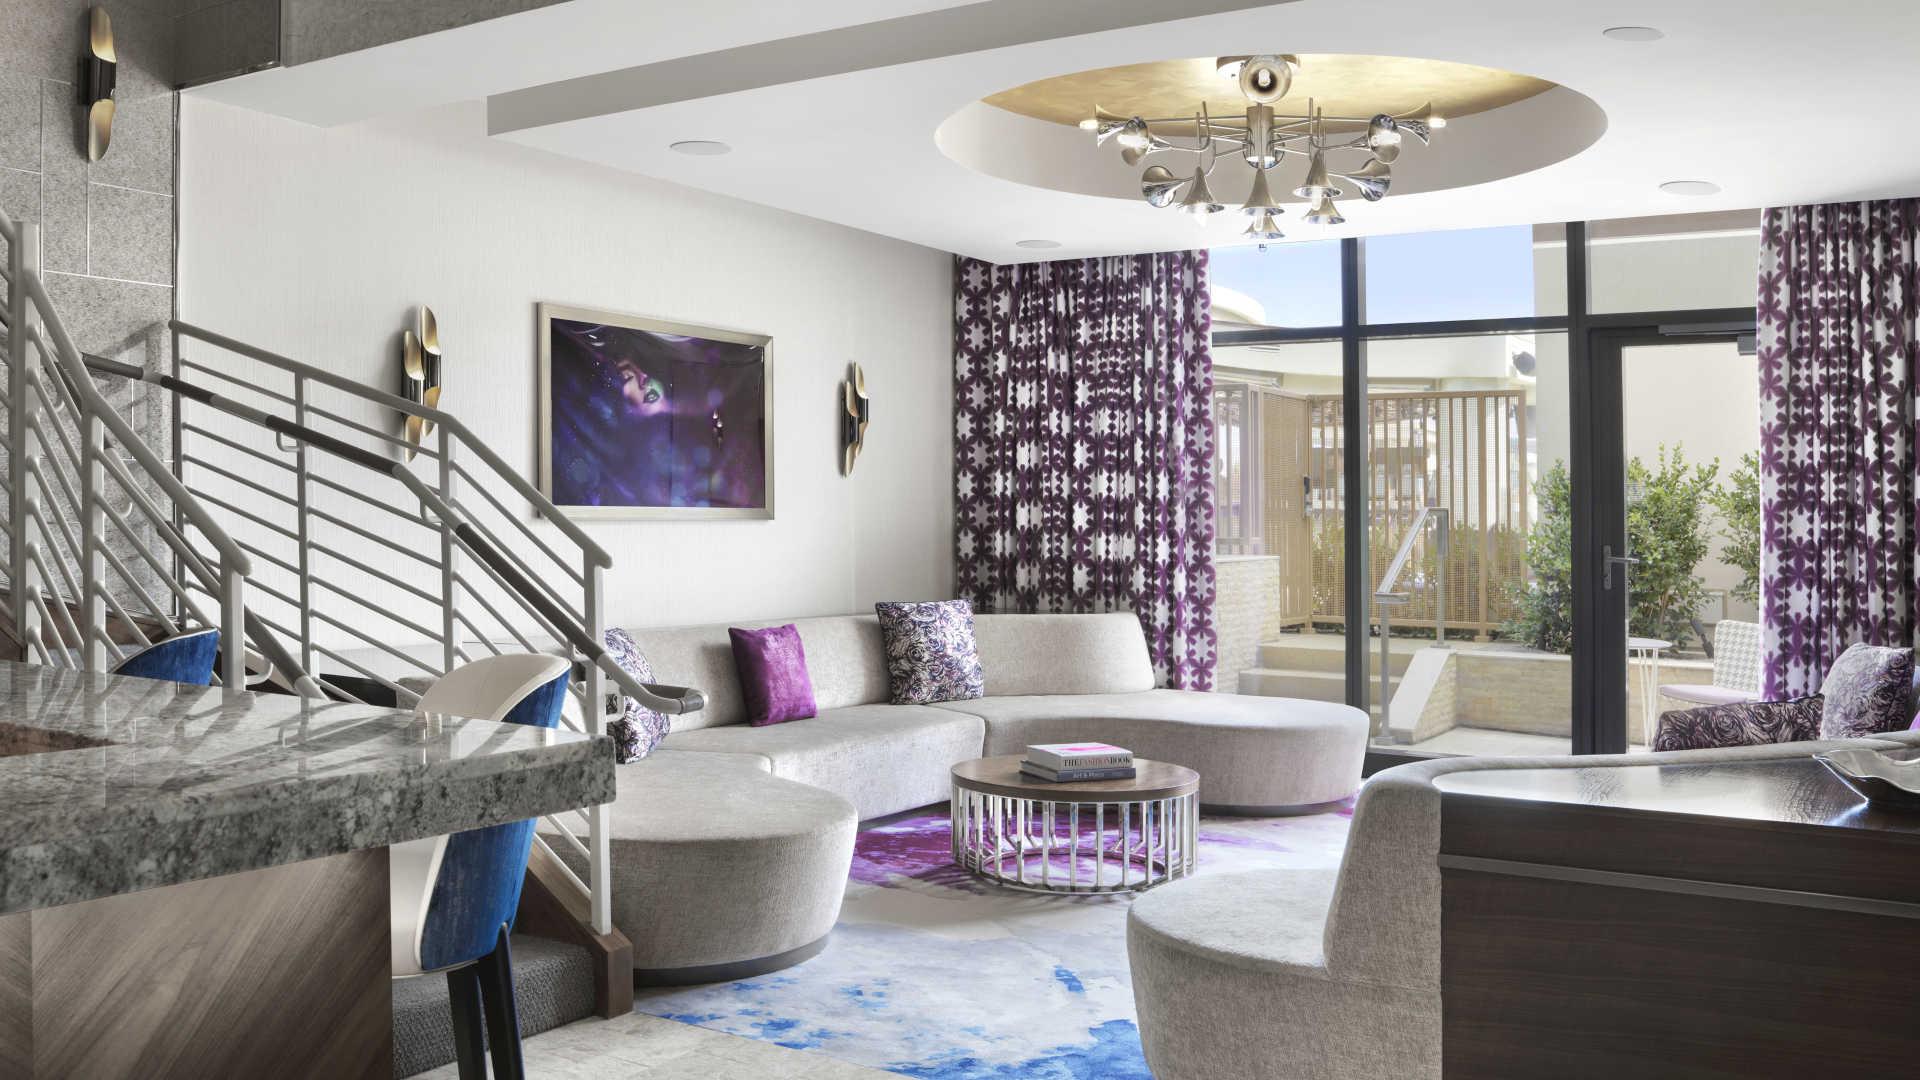 The Cosmopolitan Las Vegas Bungalow Suite Price